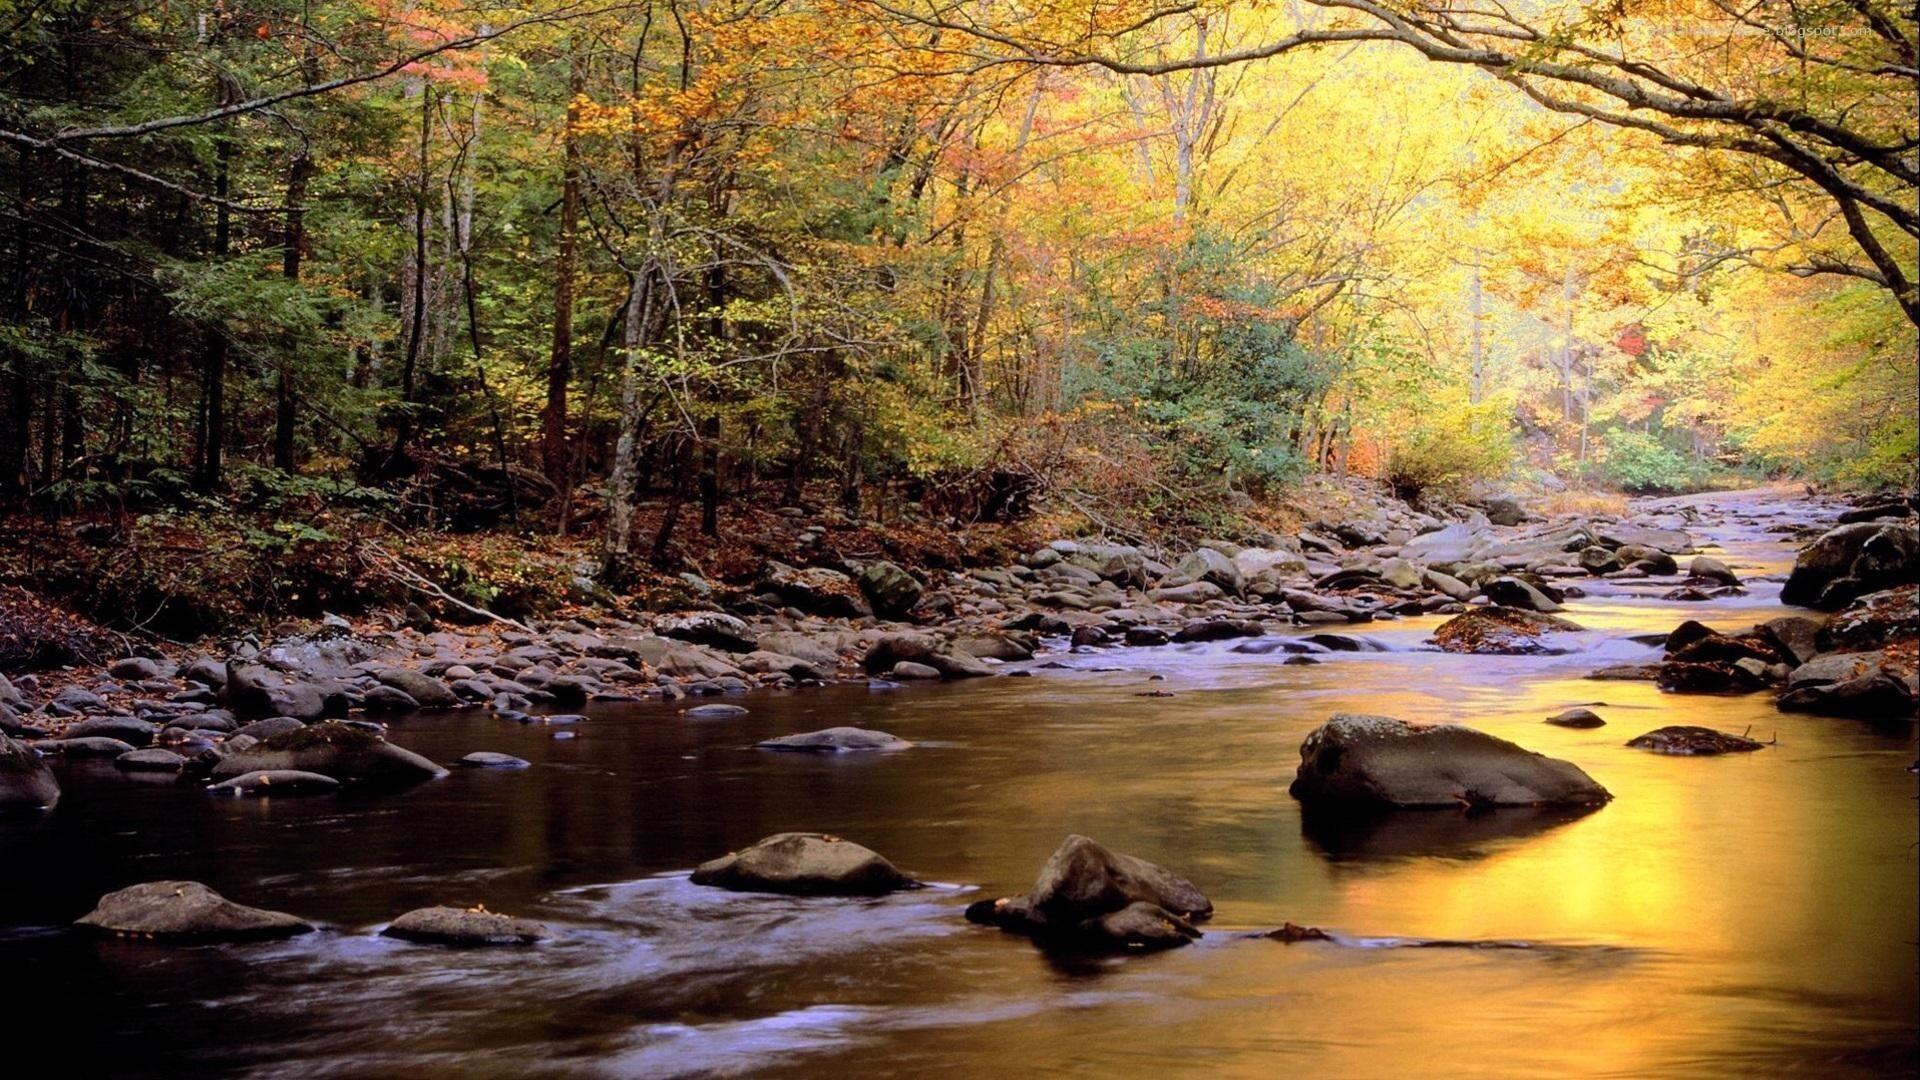 Hd wallpaper river - River Wallpapers